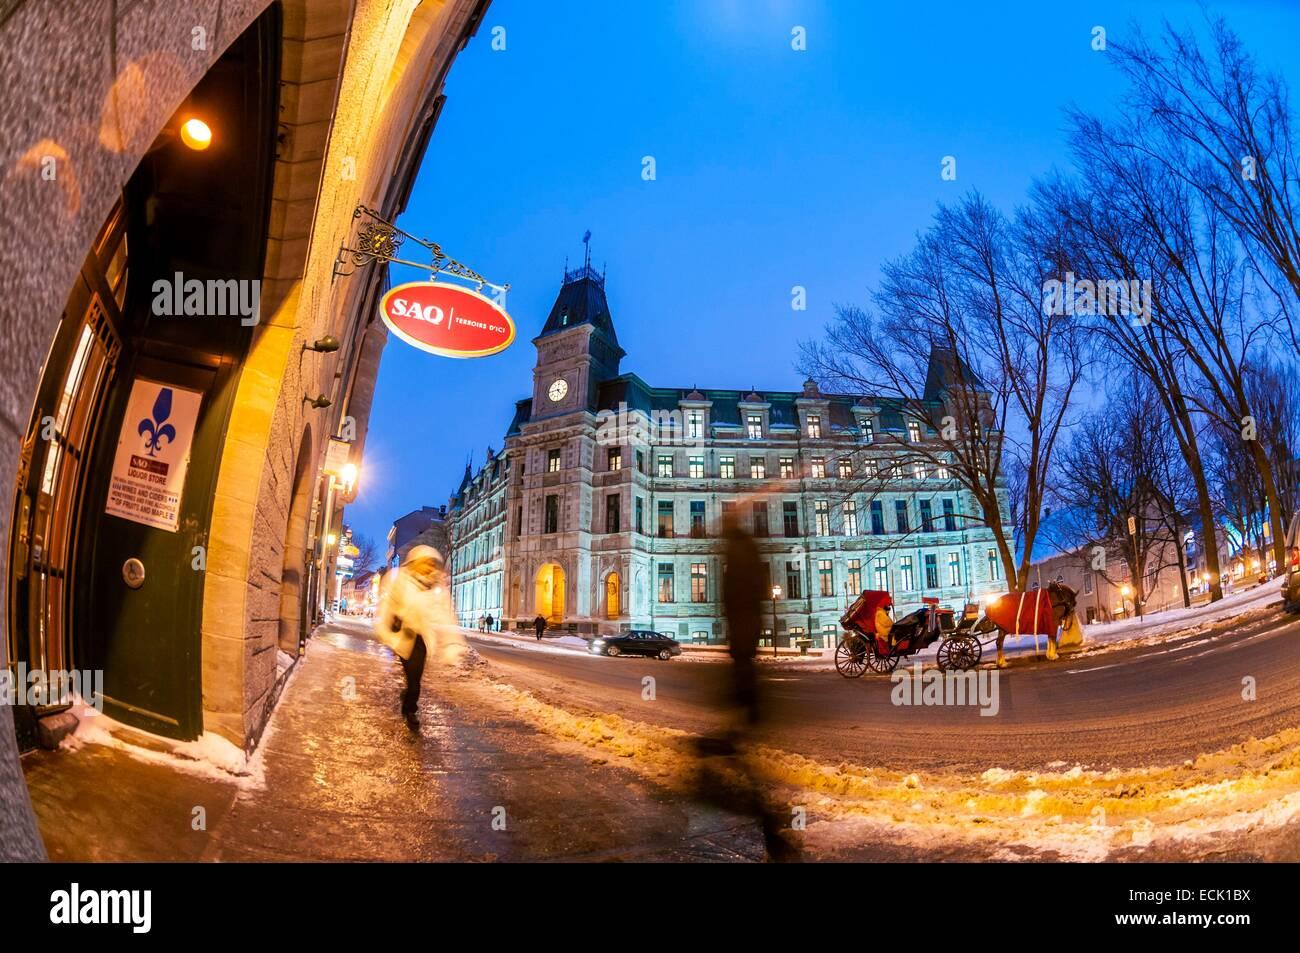 Canada, Provincia di Quebec Quebec, Place d'Armes giù il castello Fontenac vista sul Saint-Louis Street Immagini Stock